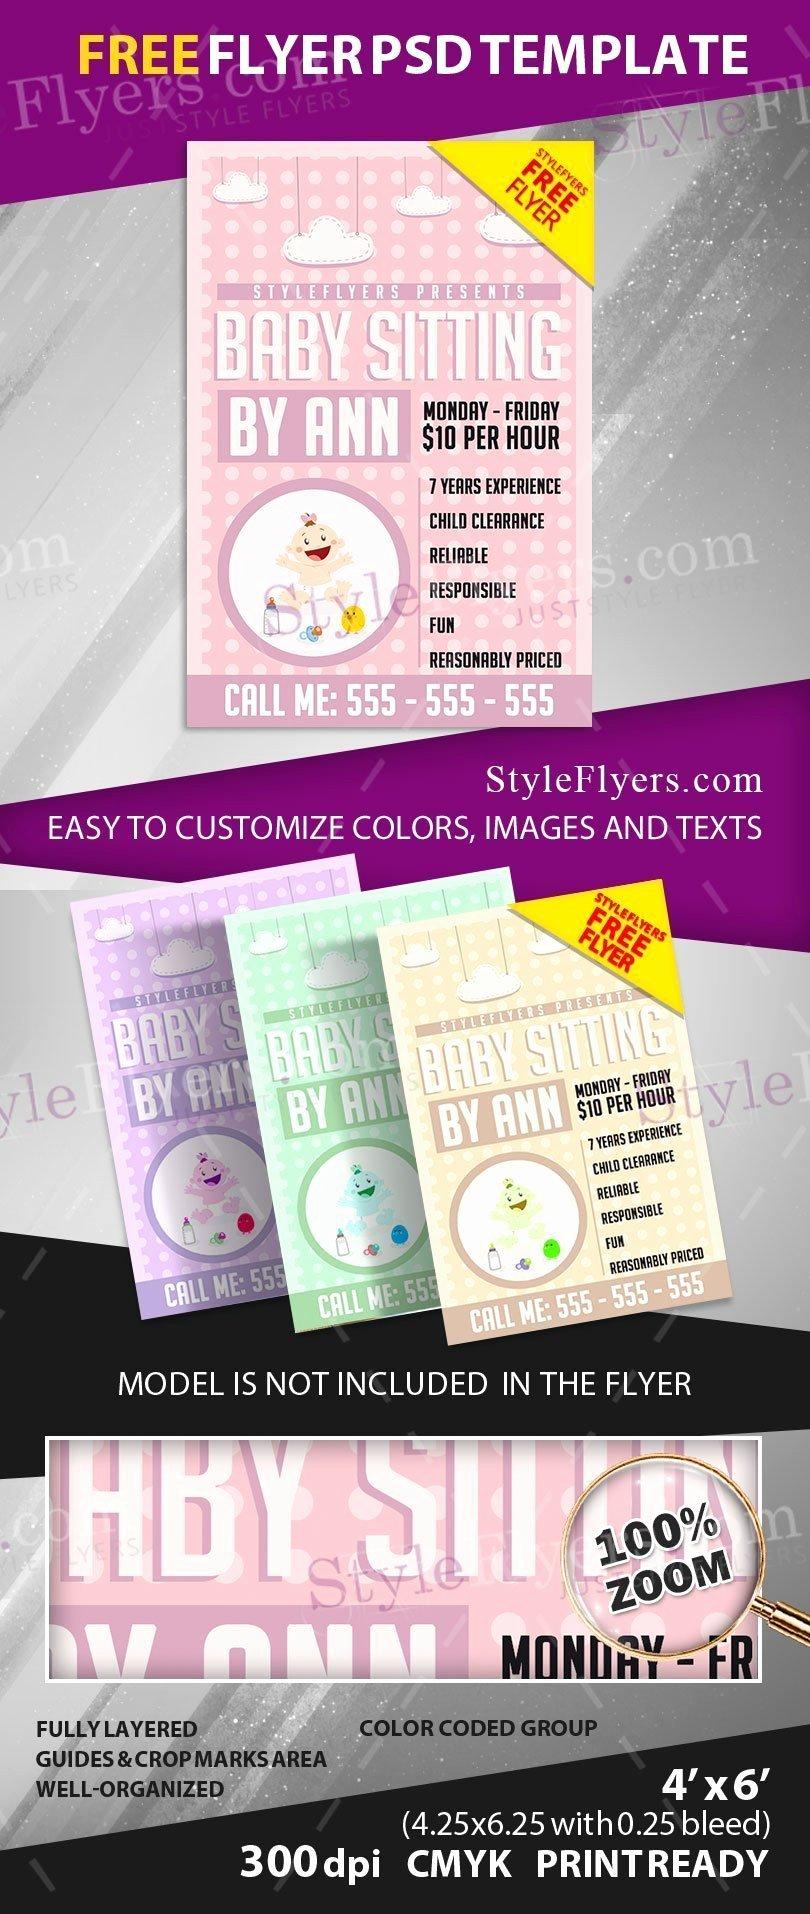 Babysitter Flyer Template Microsoft Word Lovely Babysitting Free Psd Flyer Template Free Download